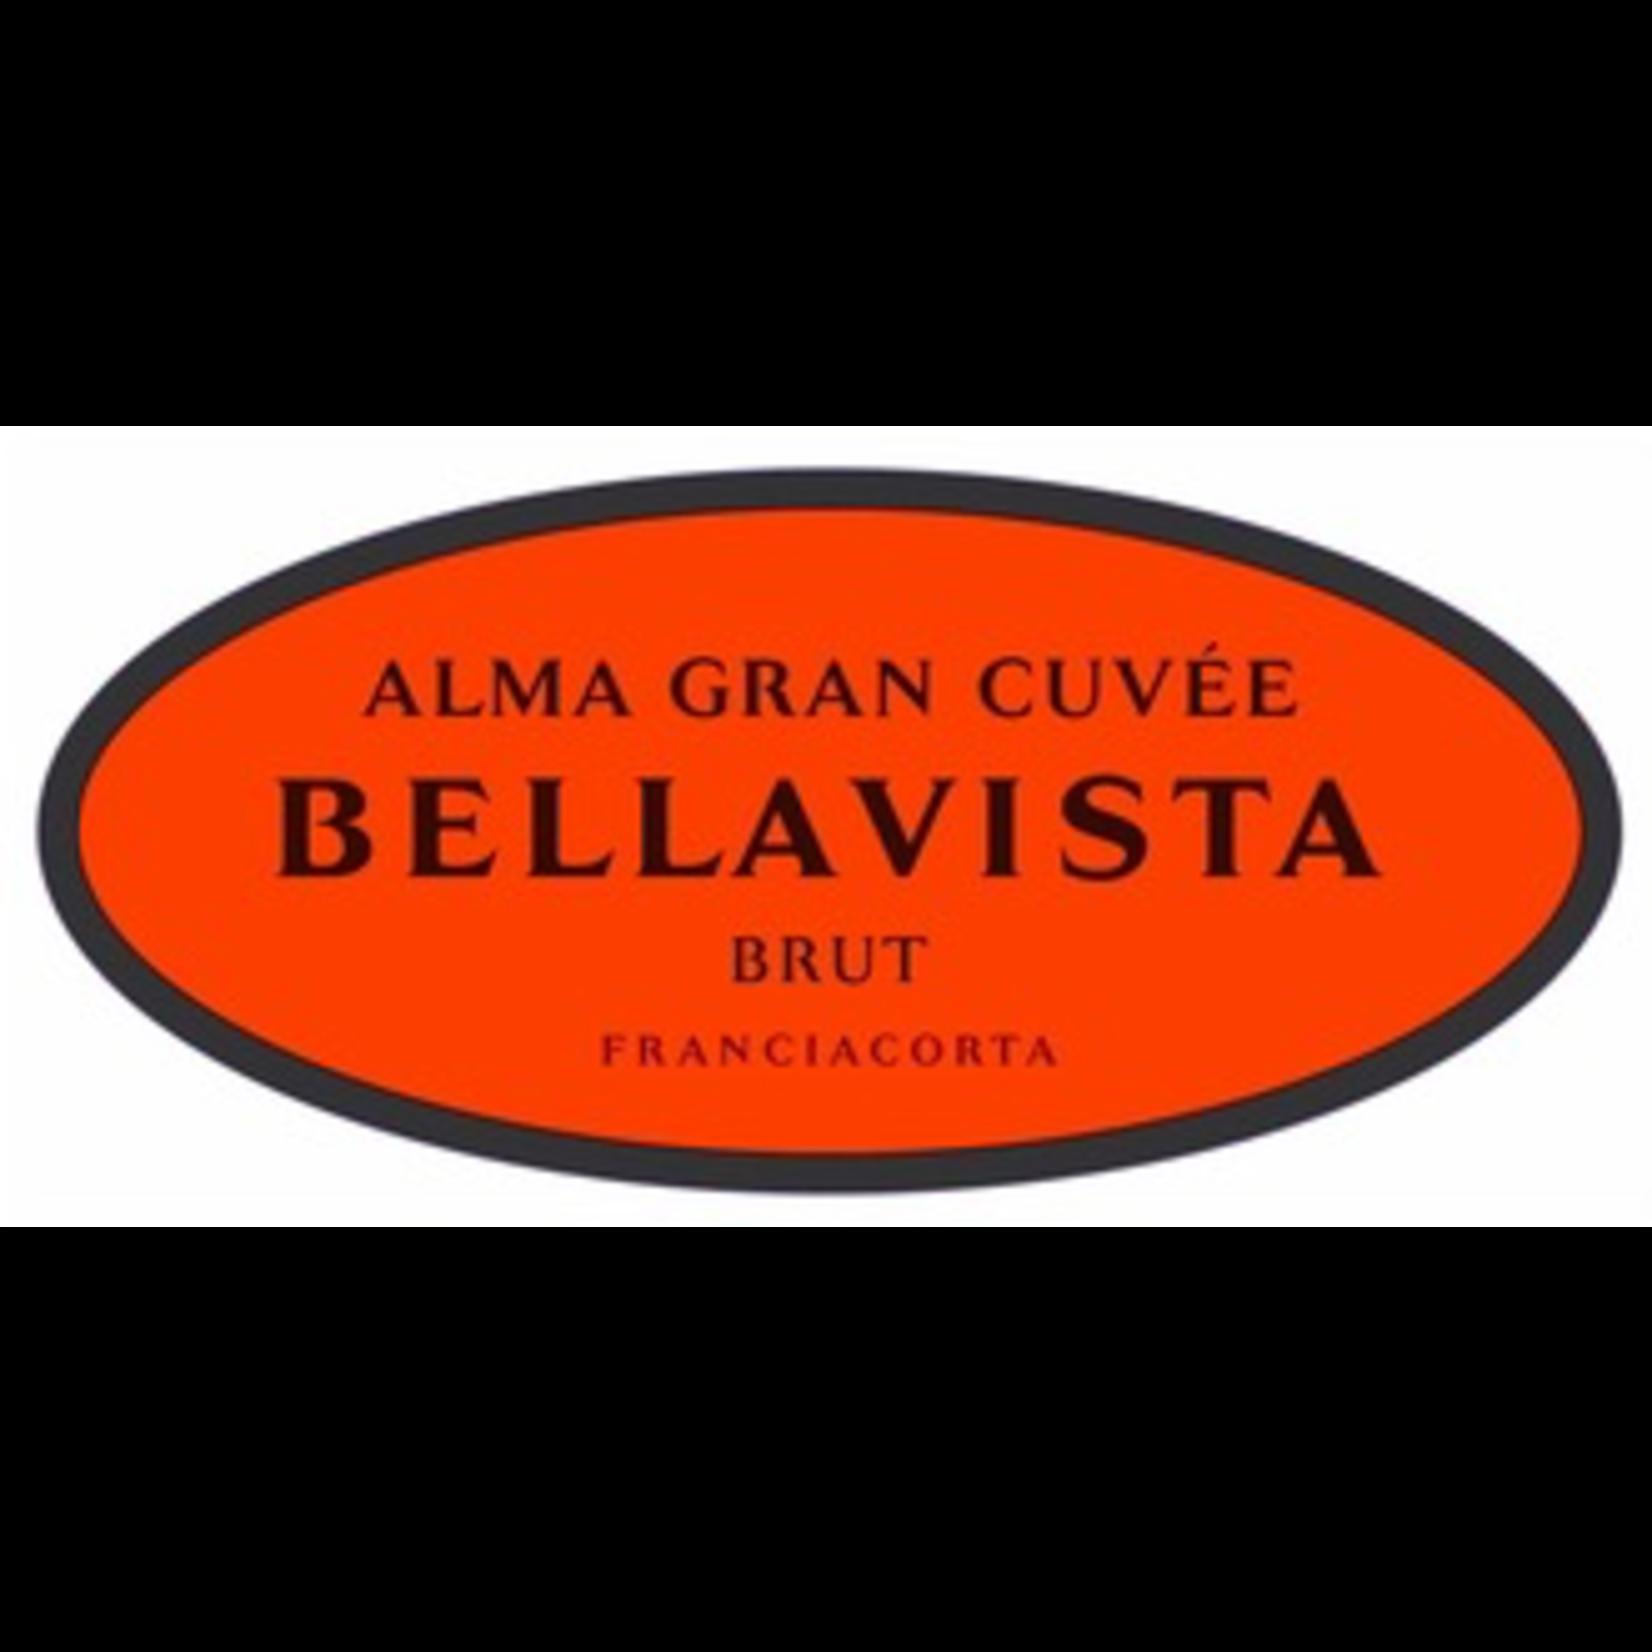 Sparkling Bellavista Franciacorta Brut Alma Gran Cuvee